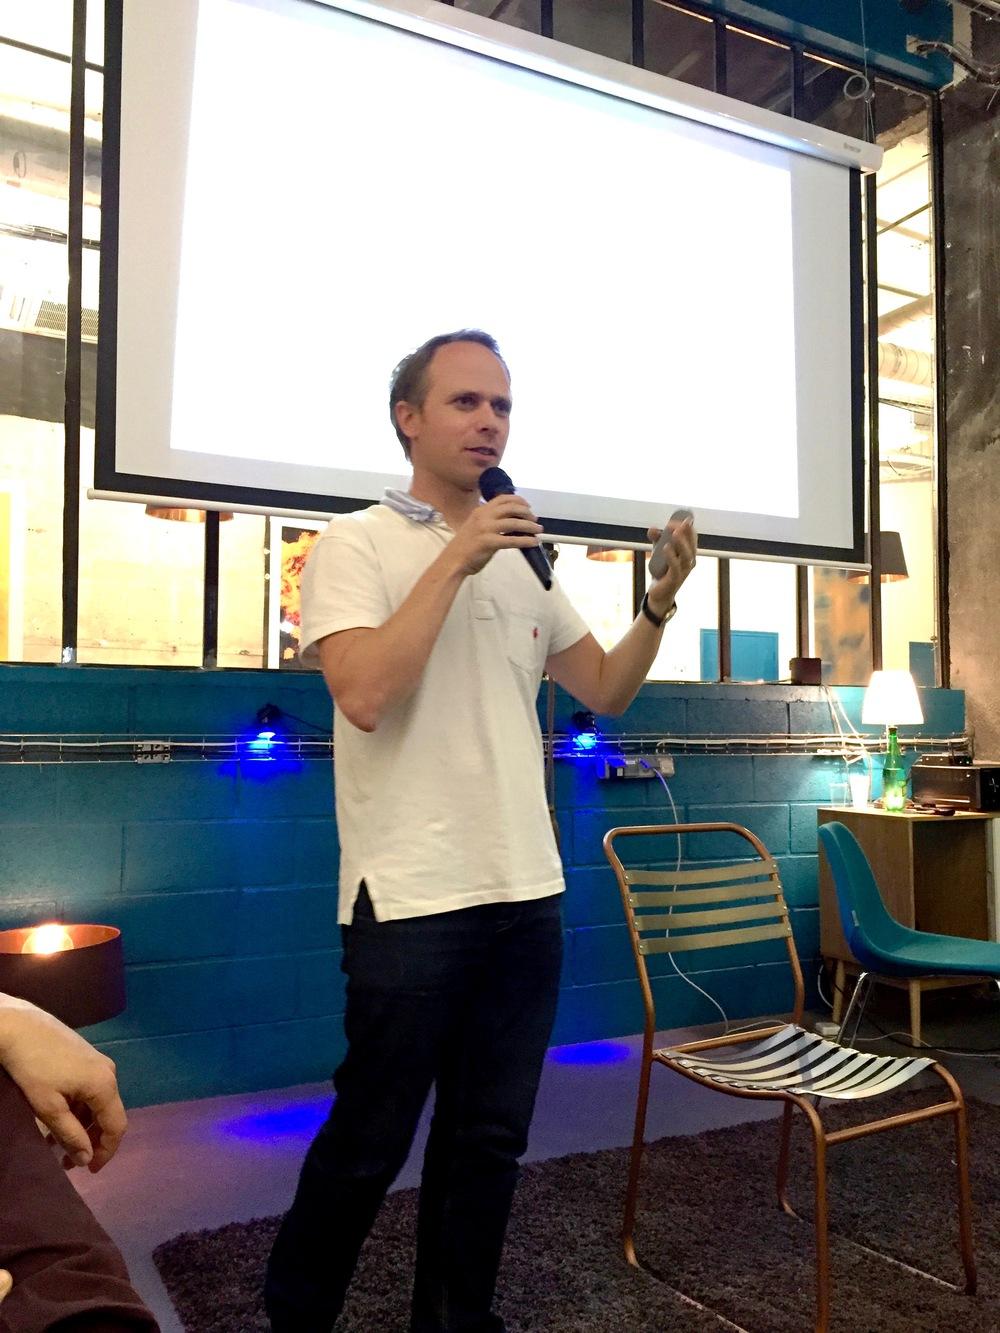 startups-calling-stringcan-interactive-remix-coworking-paris-6.jpg